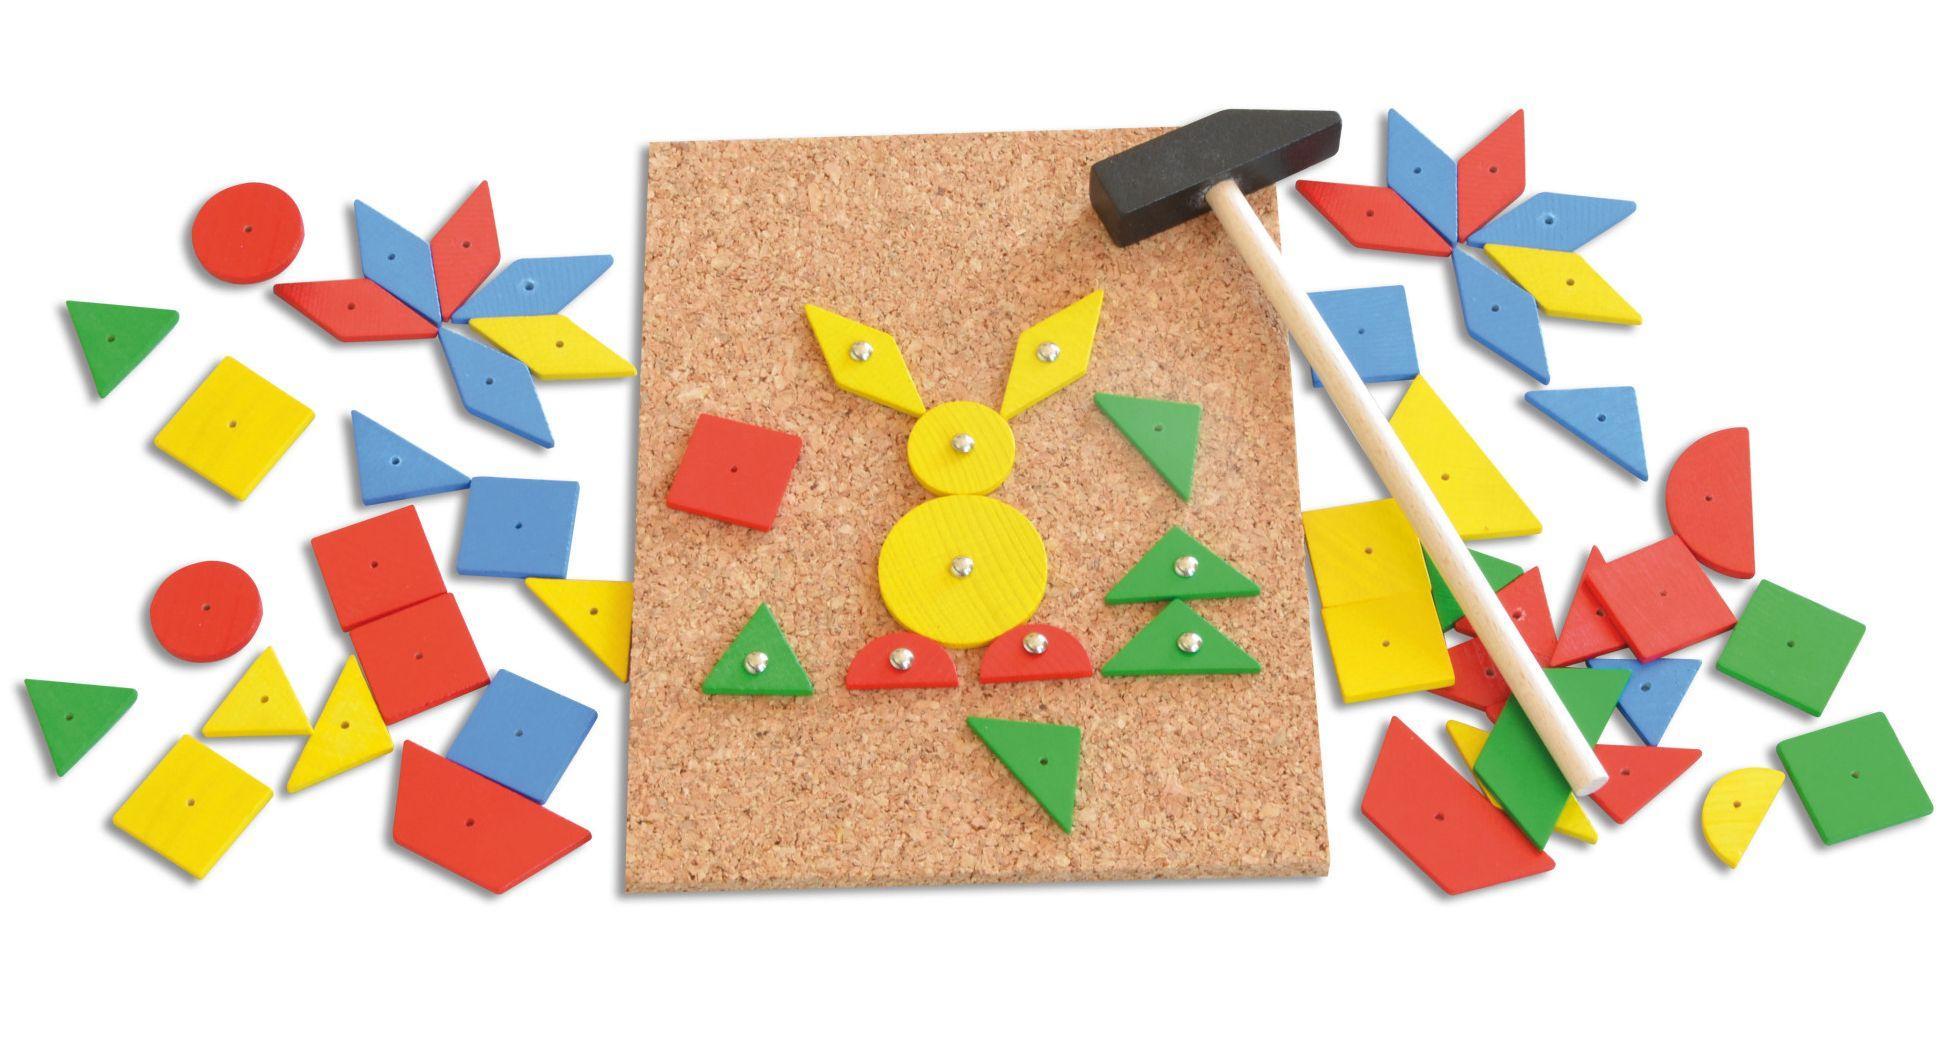 noris spiele 606049101 hammerspiel kinderspiel spielzeug. Black Bedroom Furniture Sets. Home Design Ideas